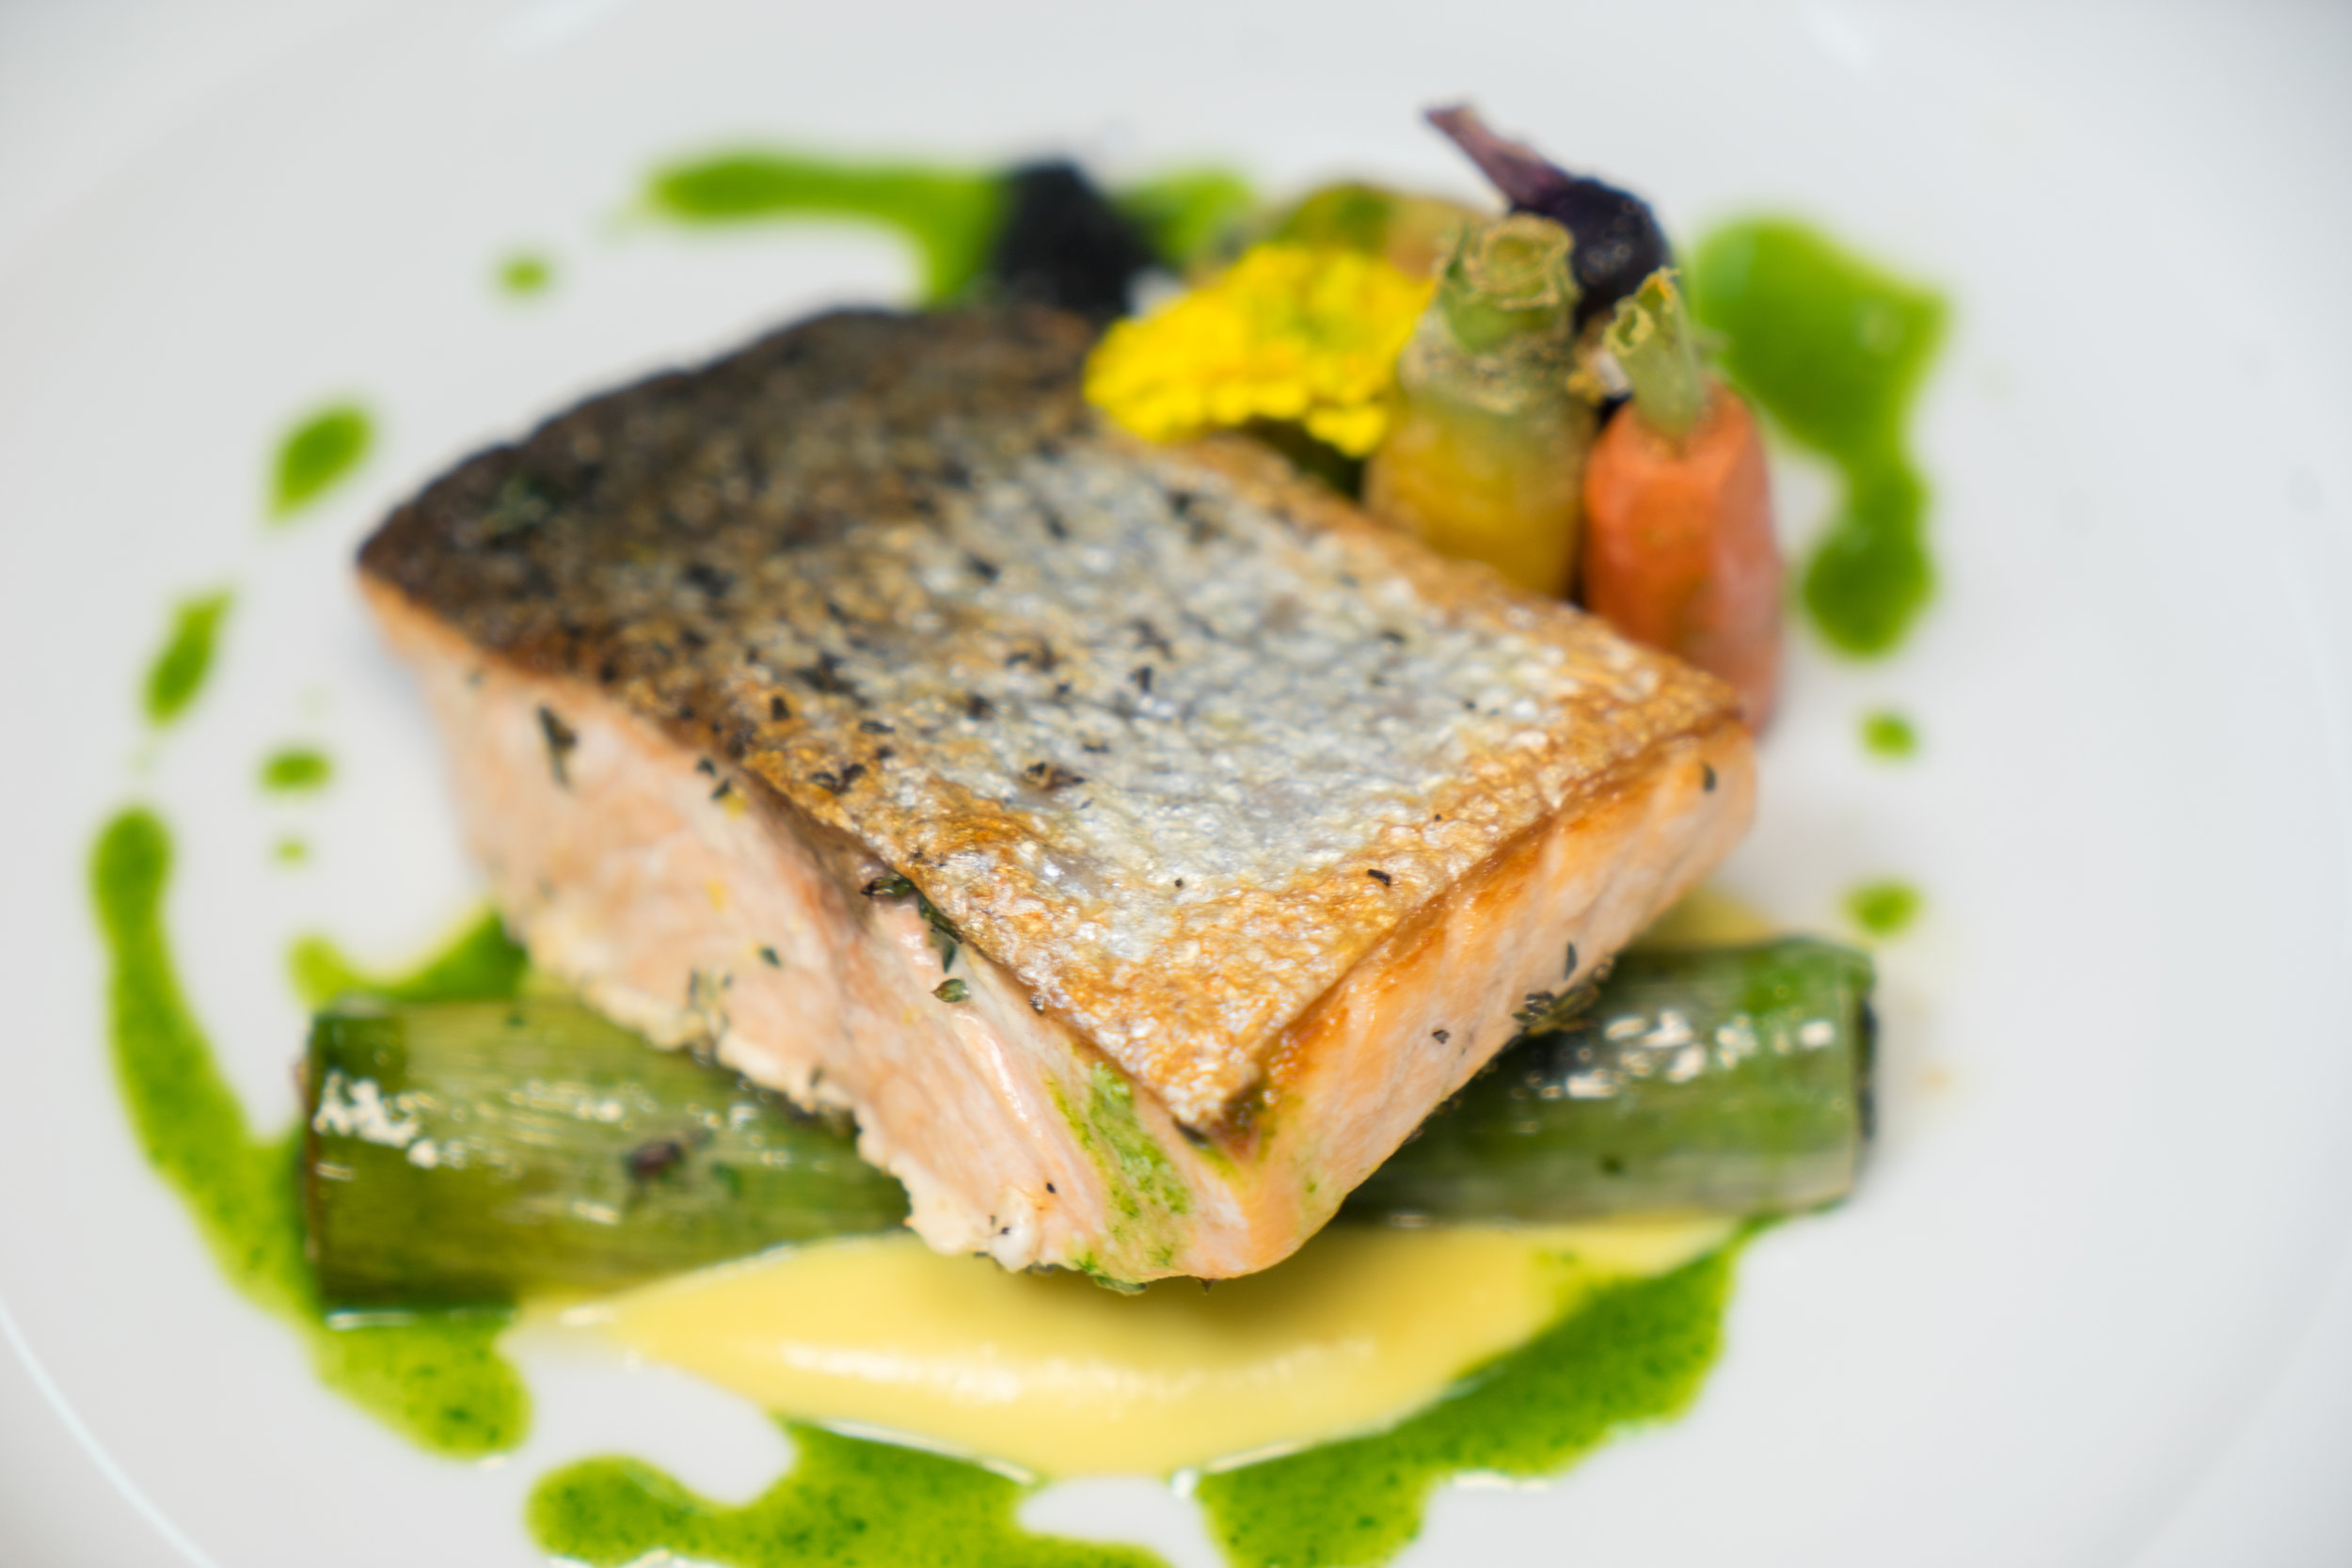 Miami Venue / Miami Catering - Baked Salmon Entree